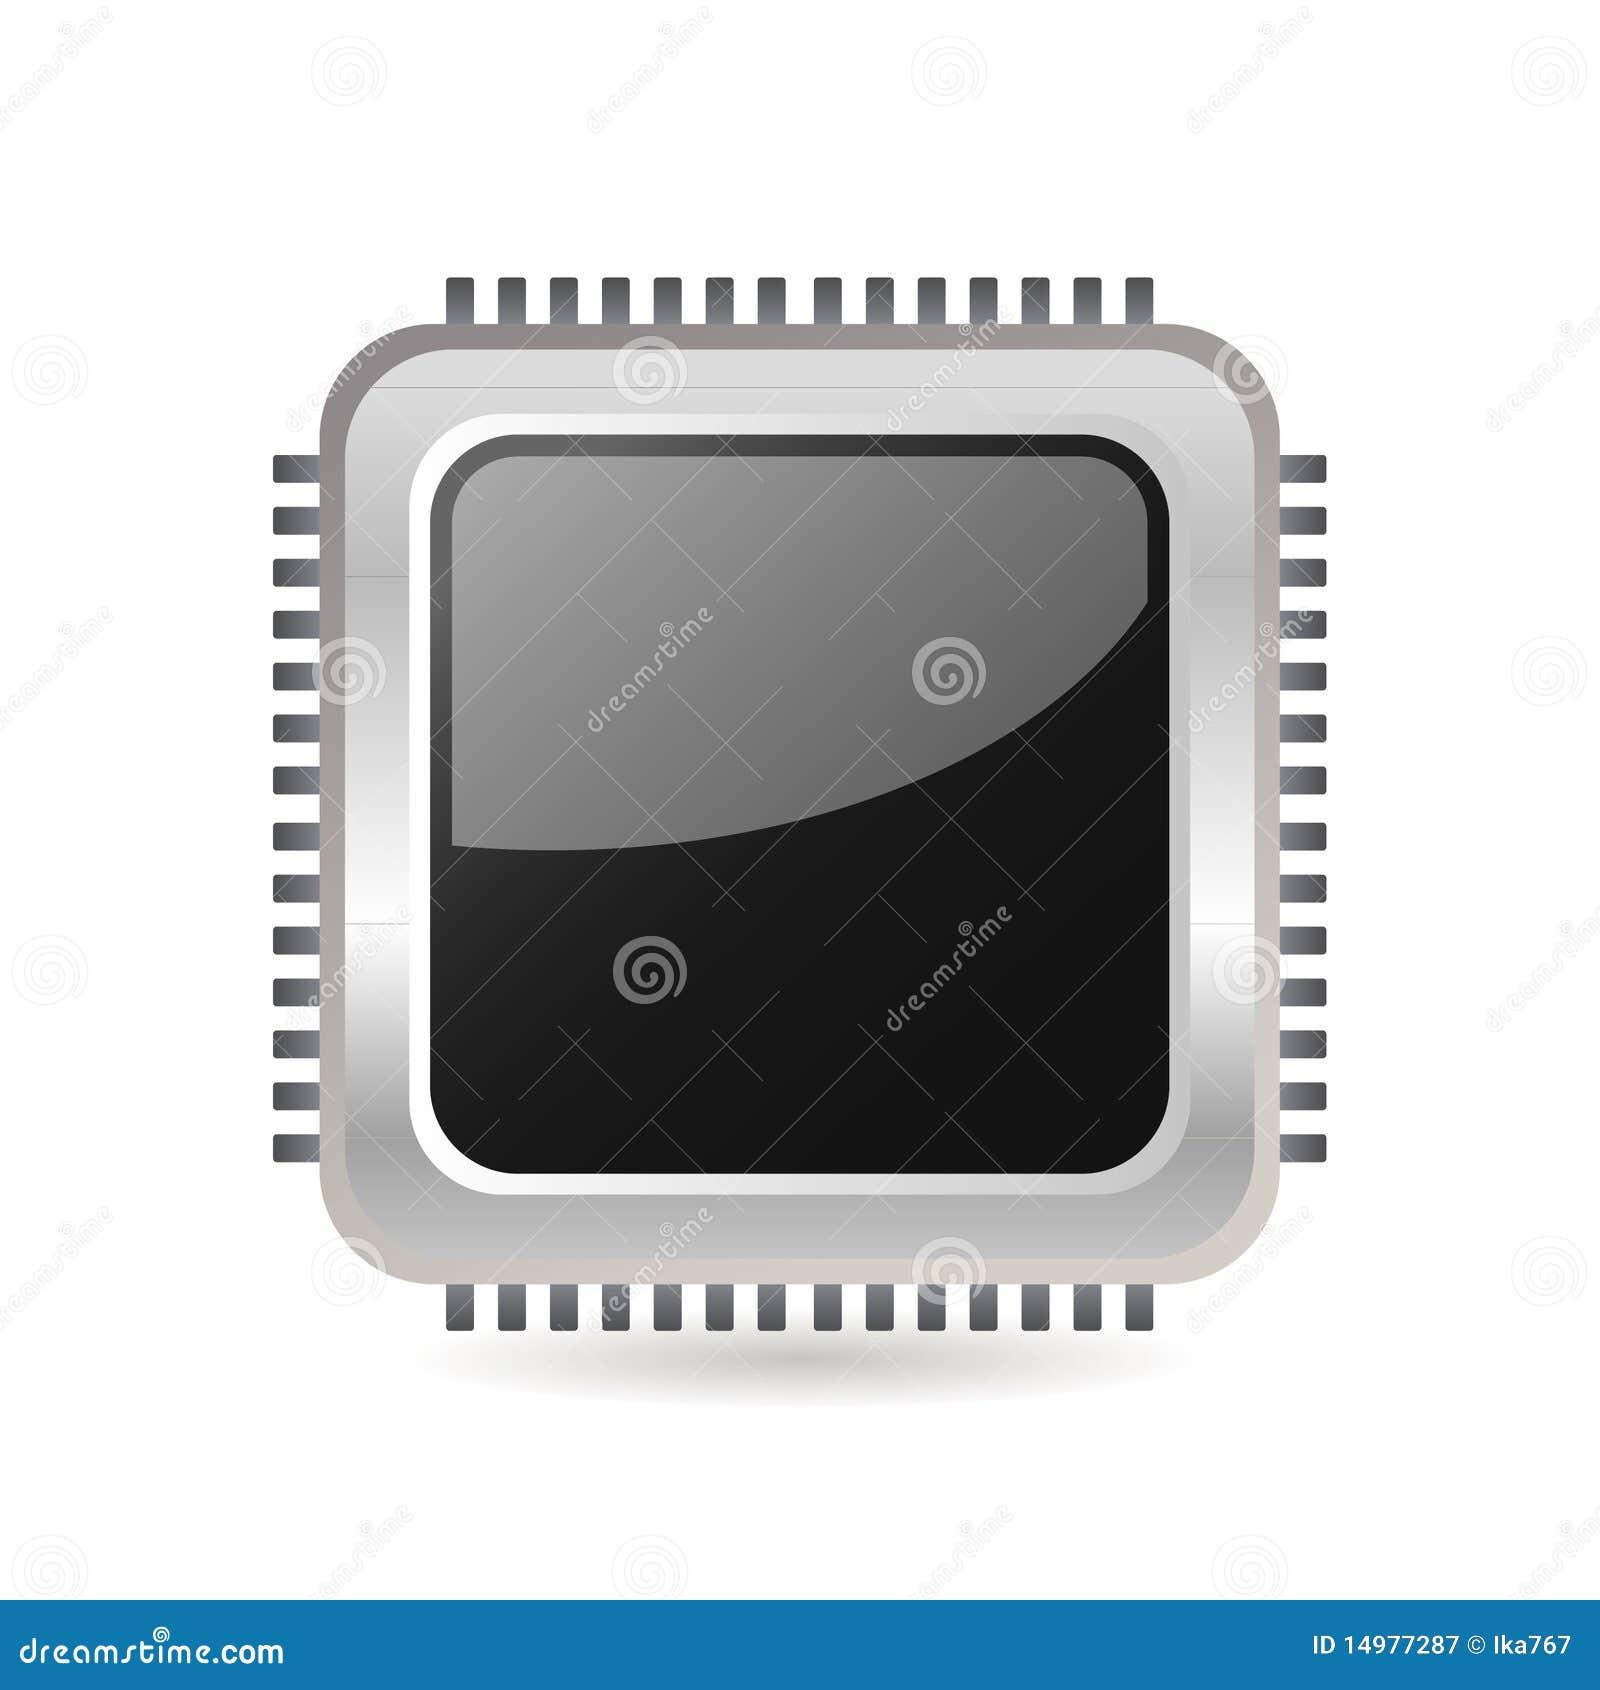 icon for video ShqvJkZ